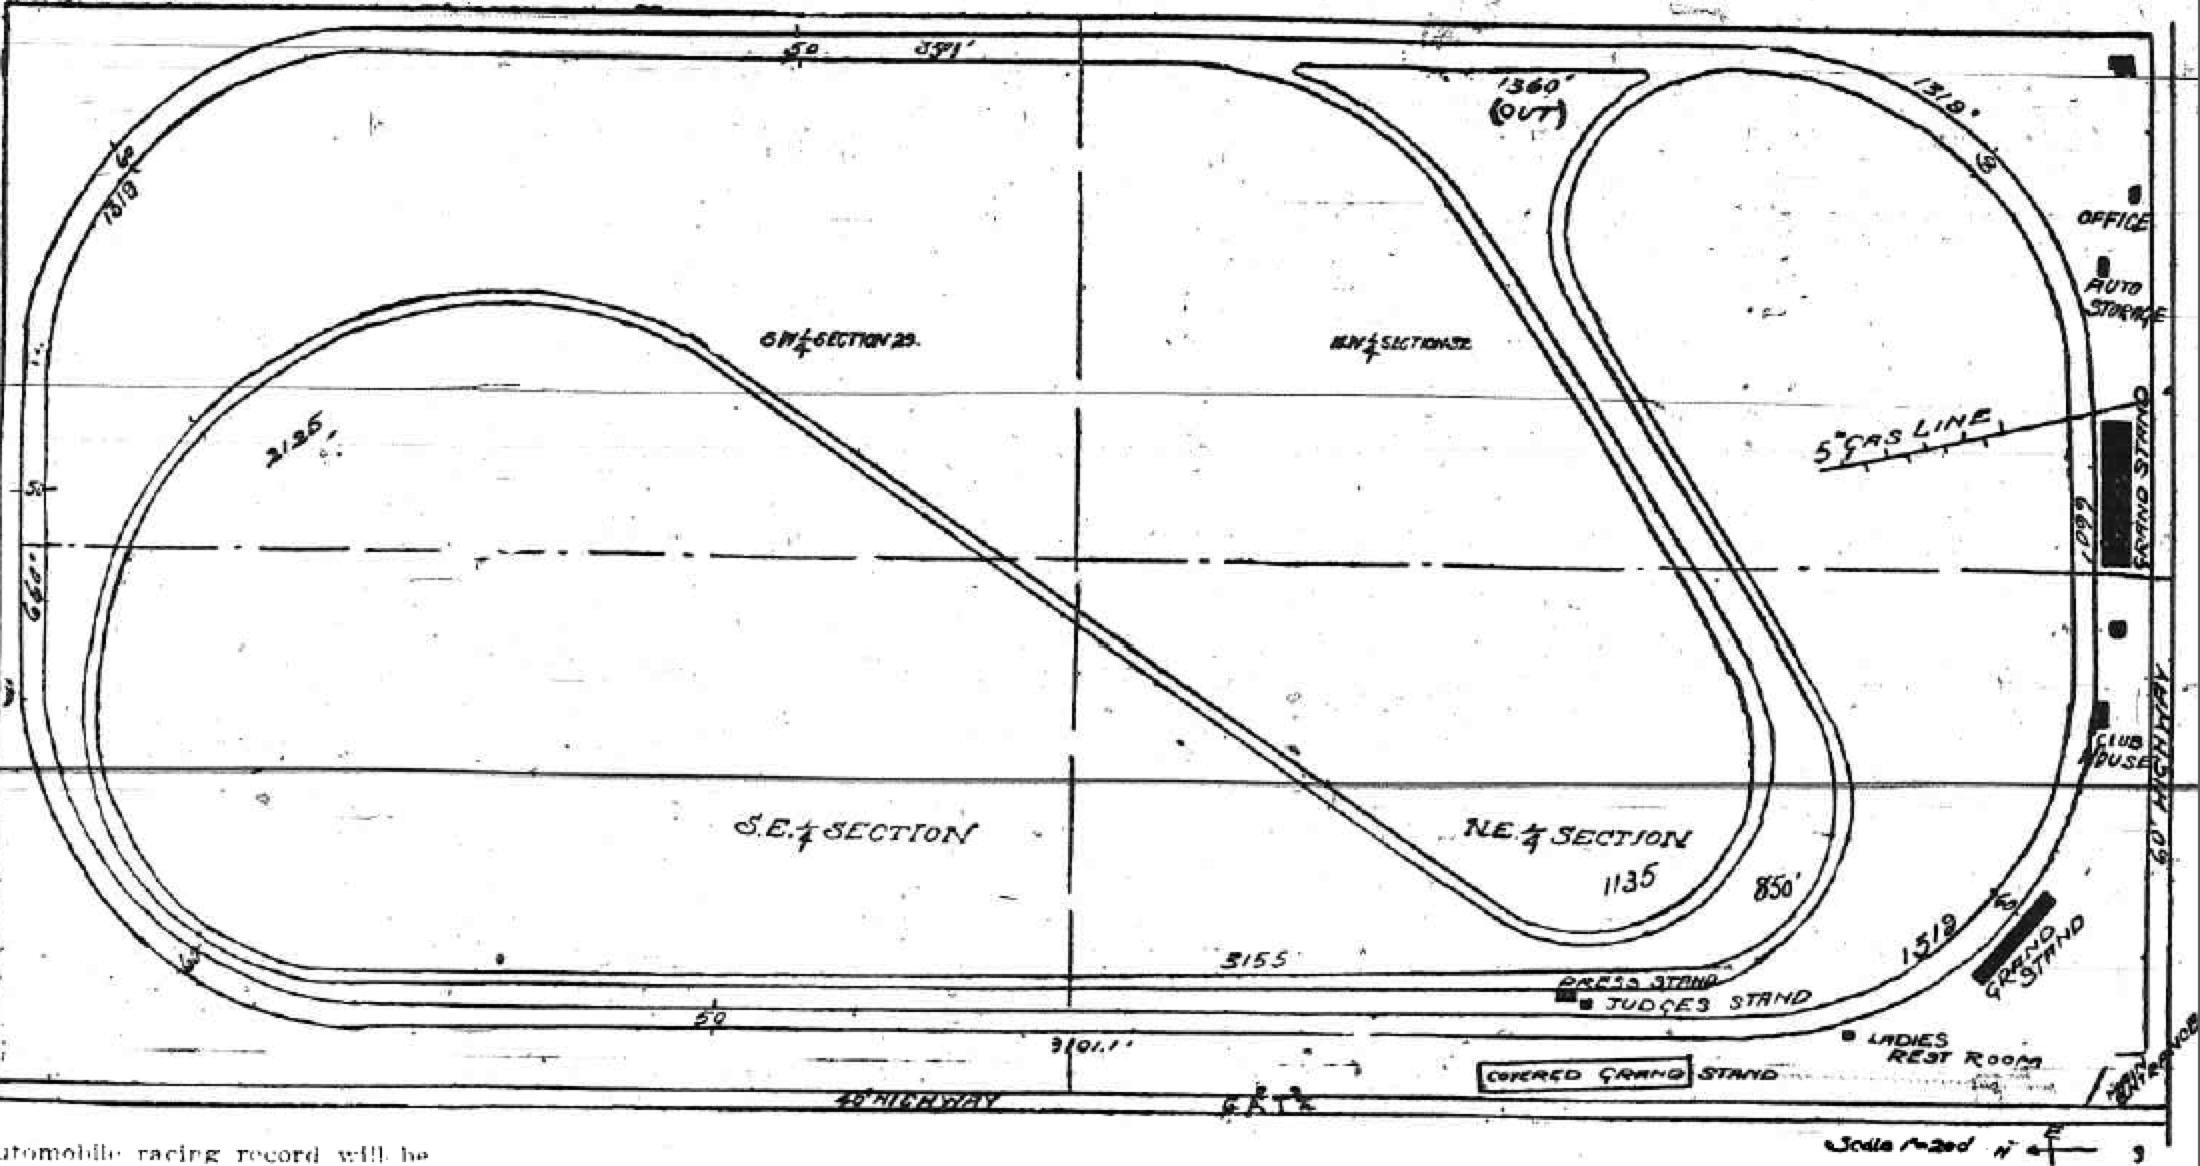 Blueprint of ims first super speedway imsconstructionplan040409 malvernweather Choice Image